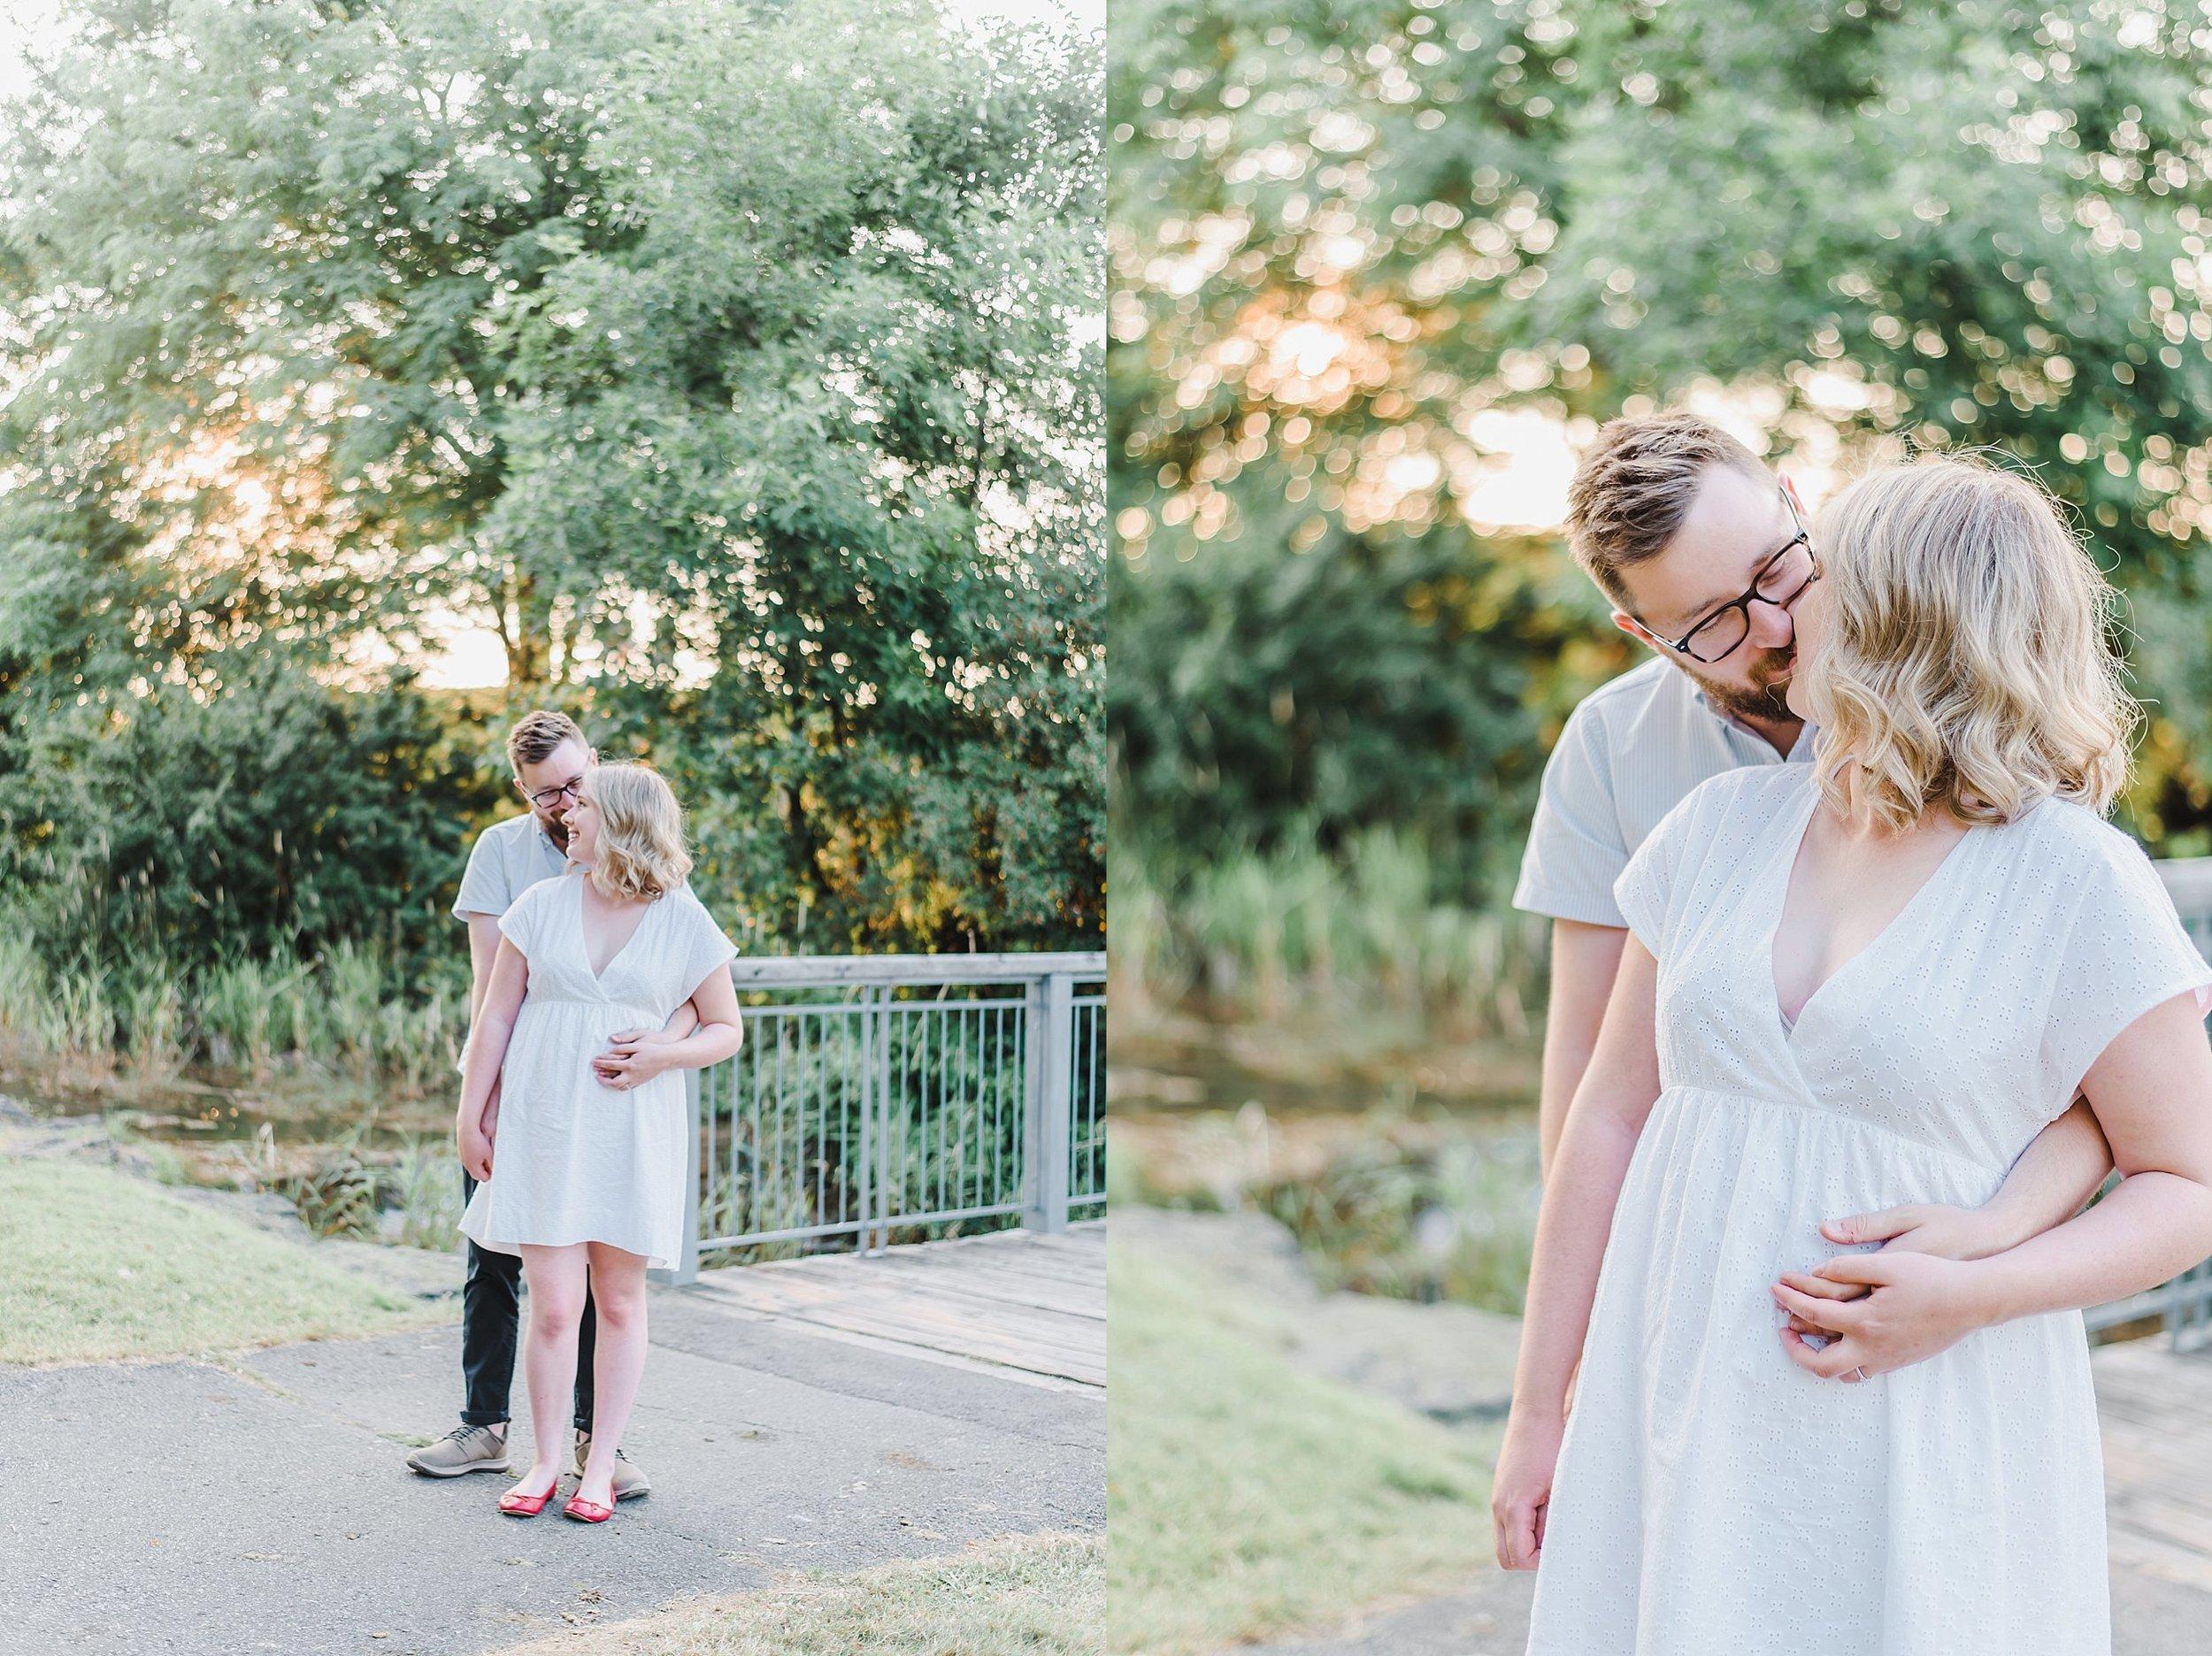 light airy indie fine art ottawa wedding photographer | Ali and Batoul Photography_0294.jpg